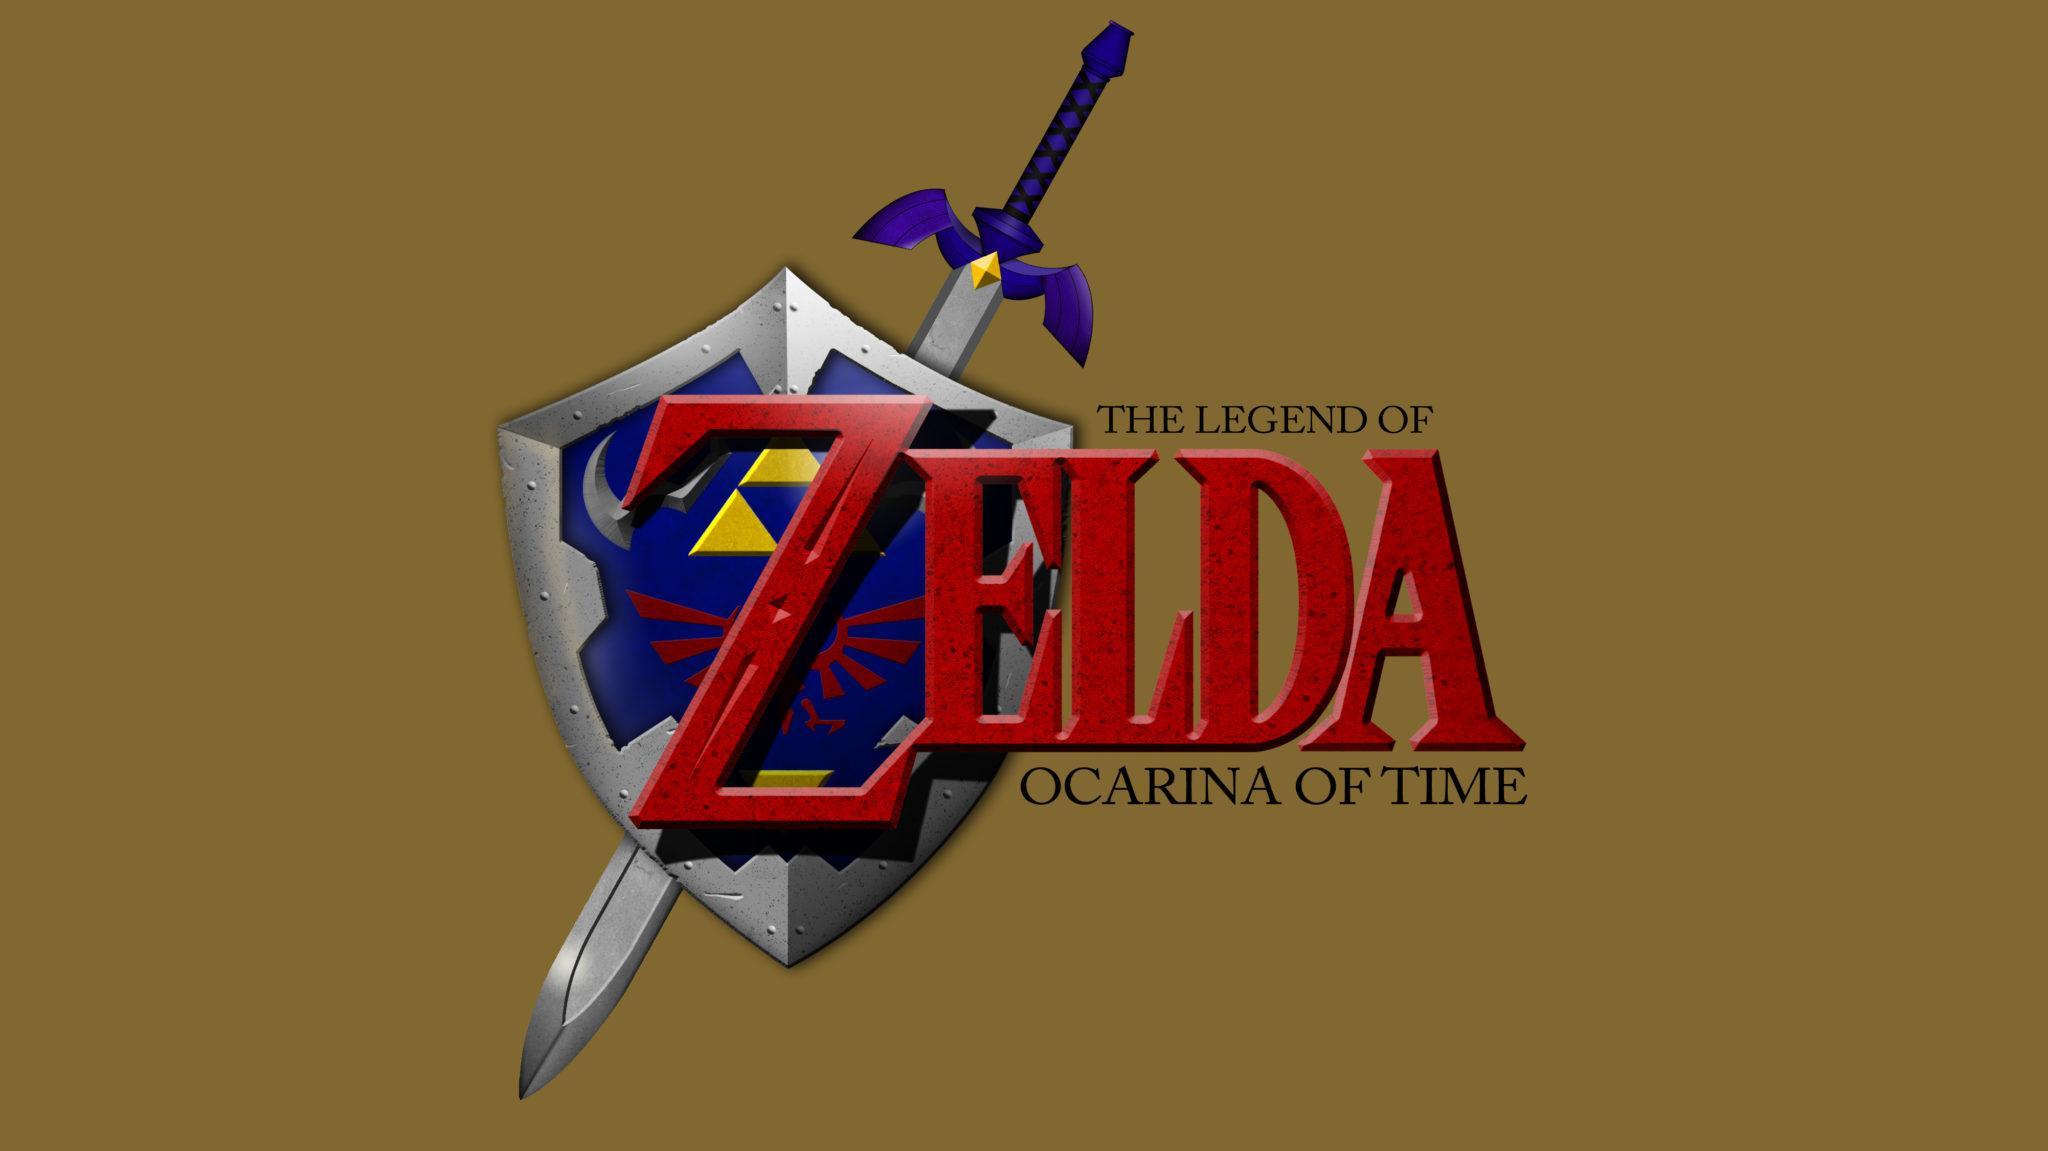 Nintendo-64 Zelda ocarina